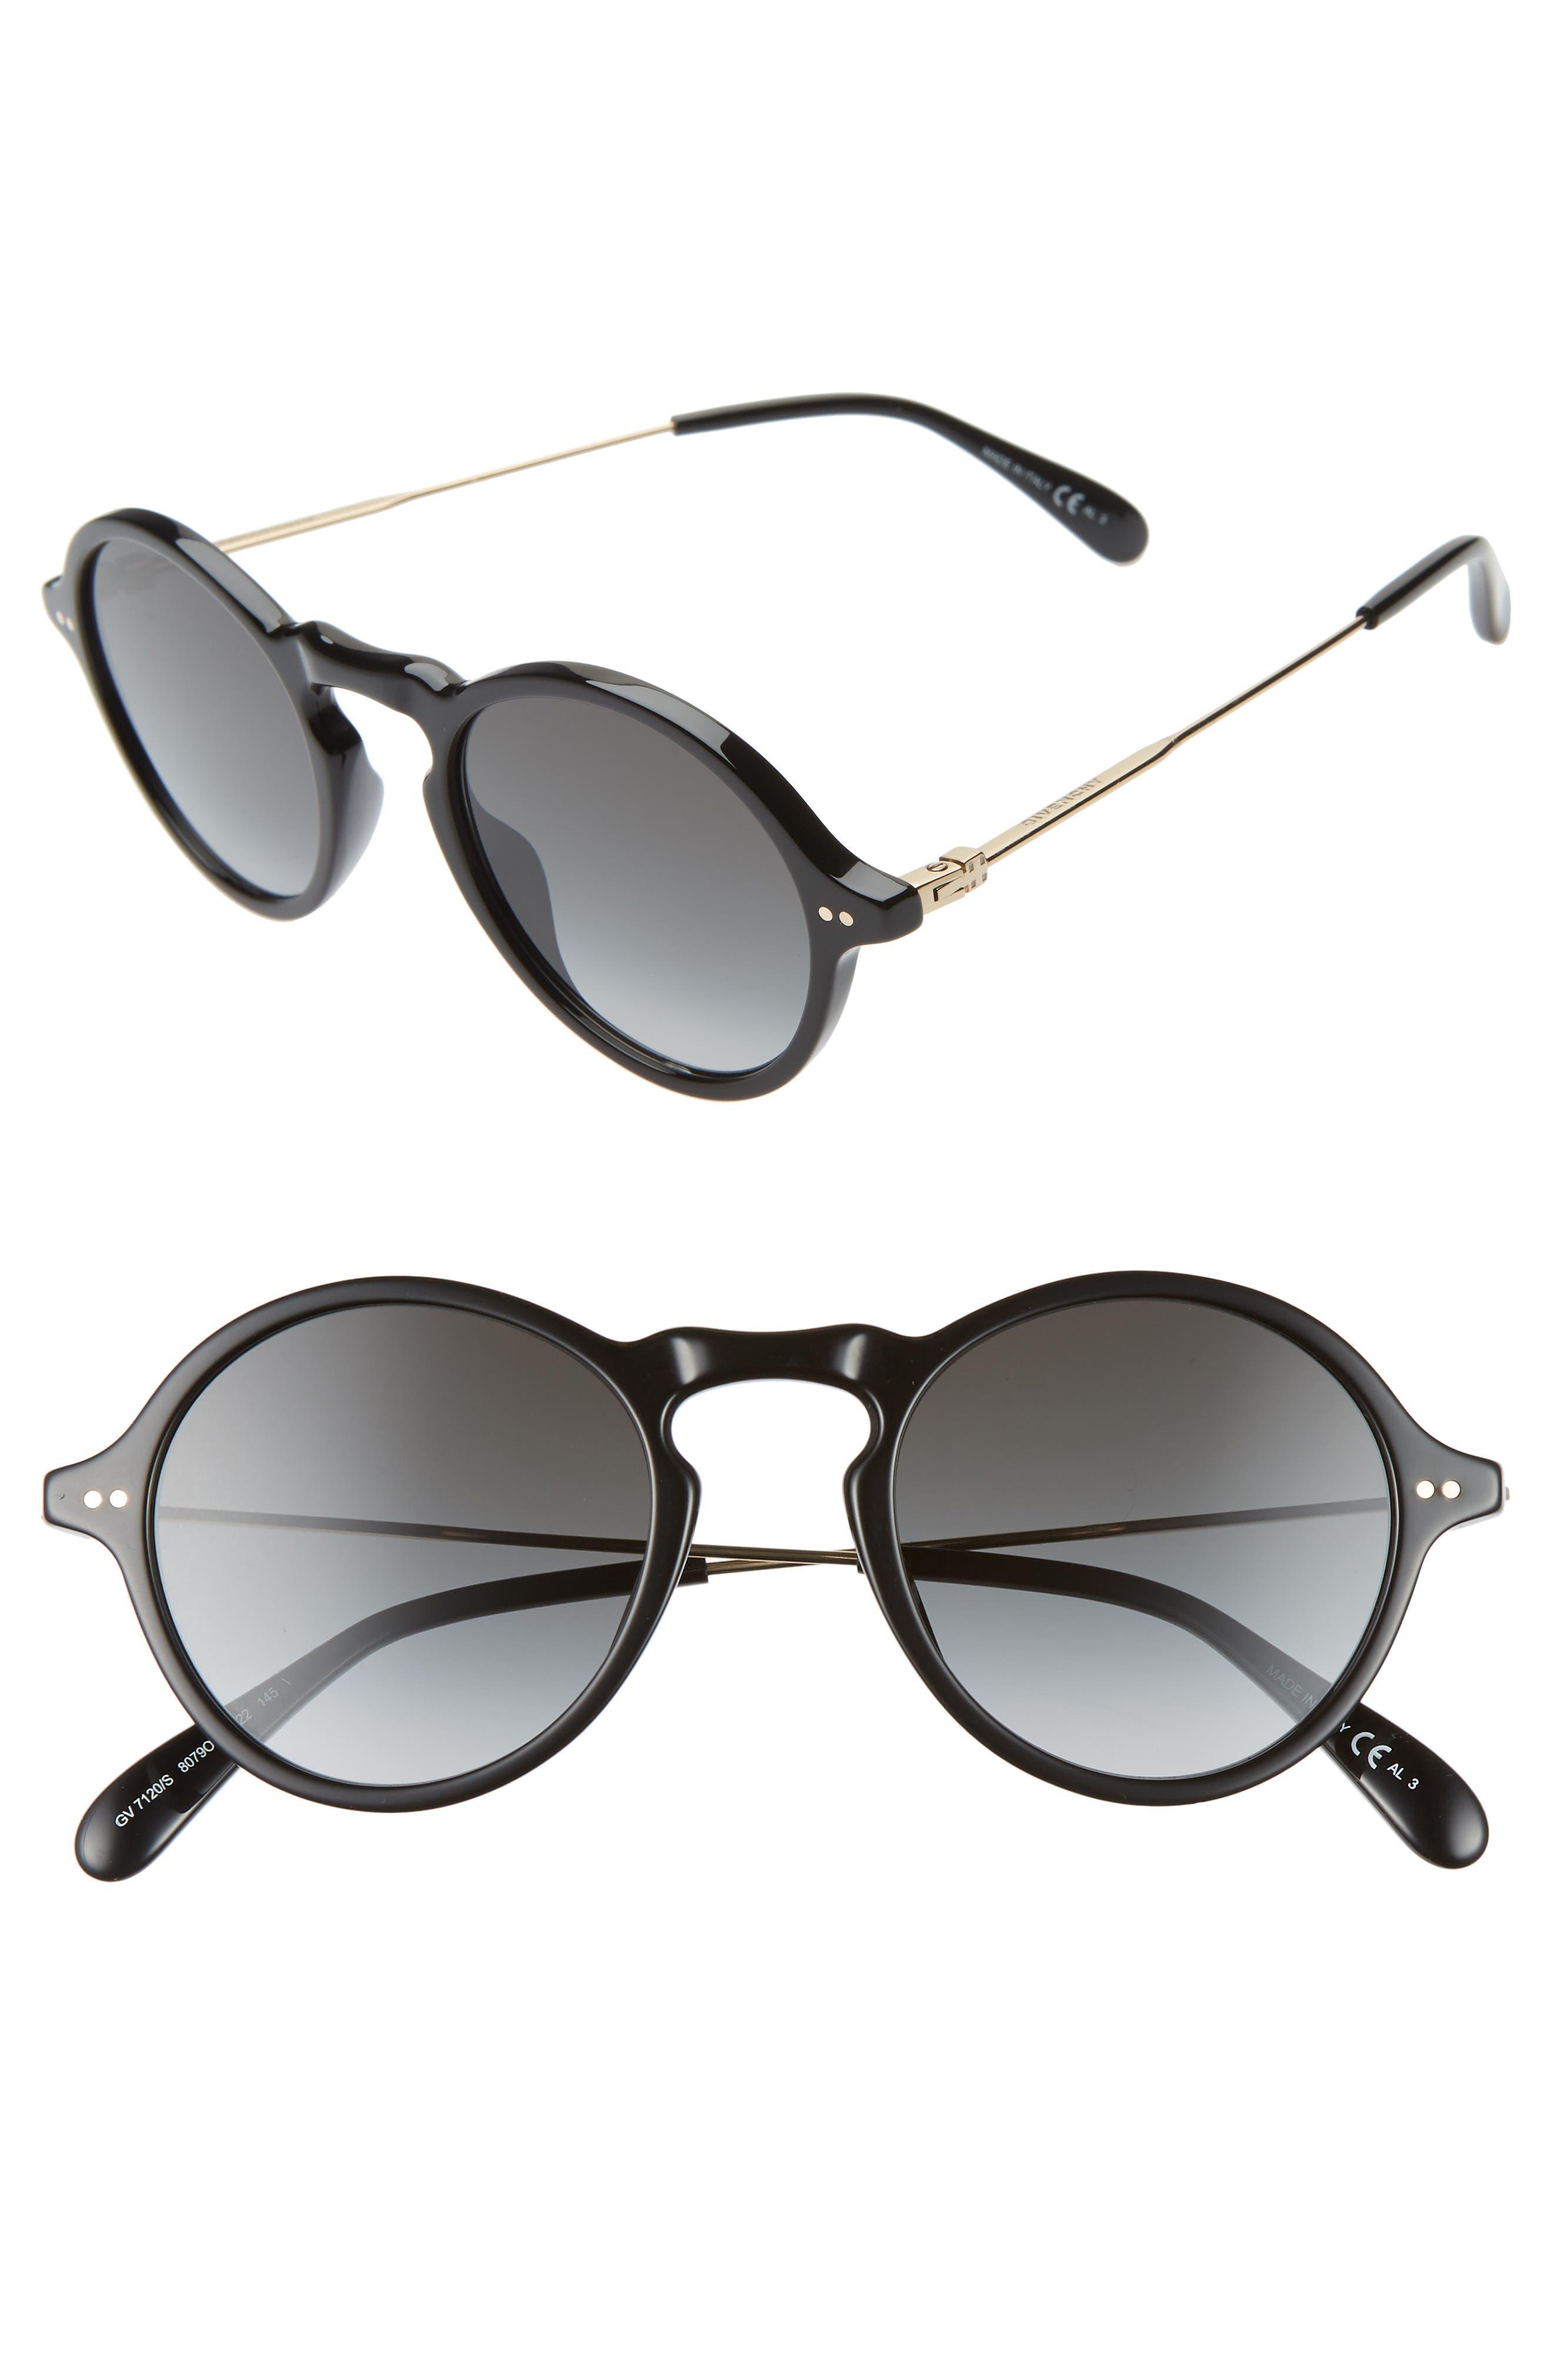 751132ce83f Givenchy 4m Round Sunglasses - Black